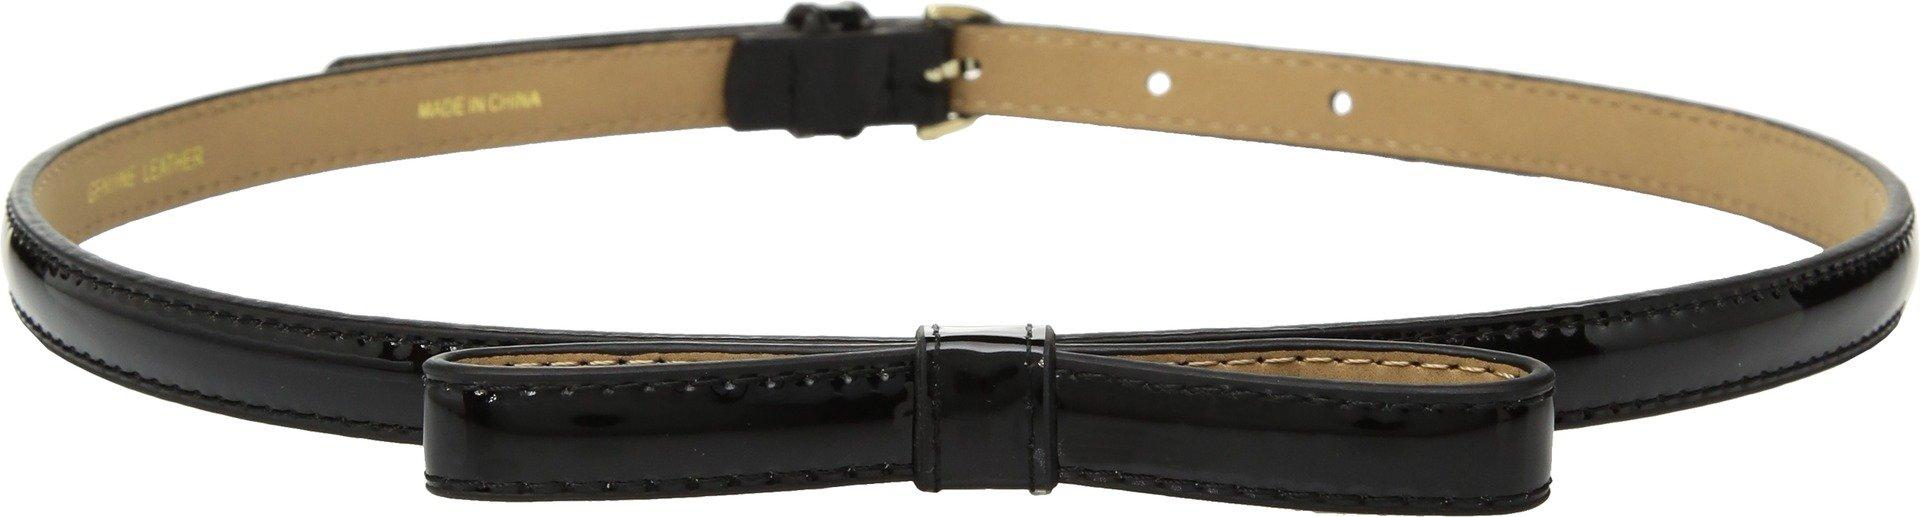 Kate Spade New York Women's Patent Skinny Bow Belt, Black, Large